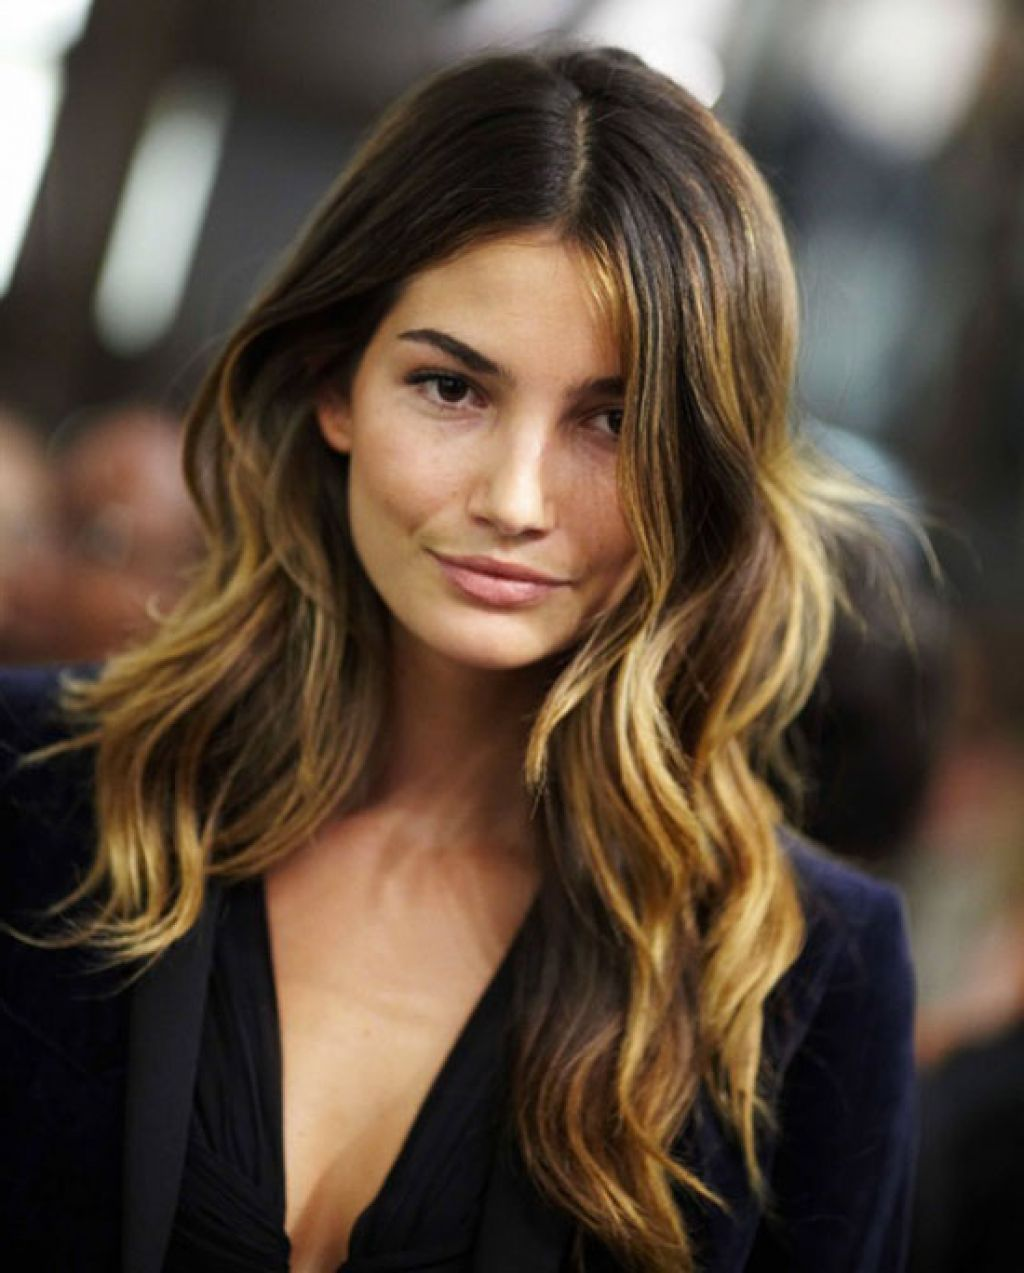 Celebrities Dark Brown Hair With Caramel Highlights Dark Hair With Highlights Colored Hair Tips Brown Hair With Highlights